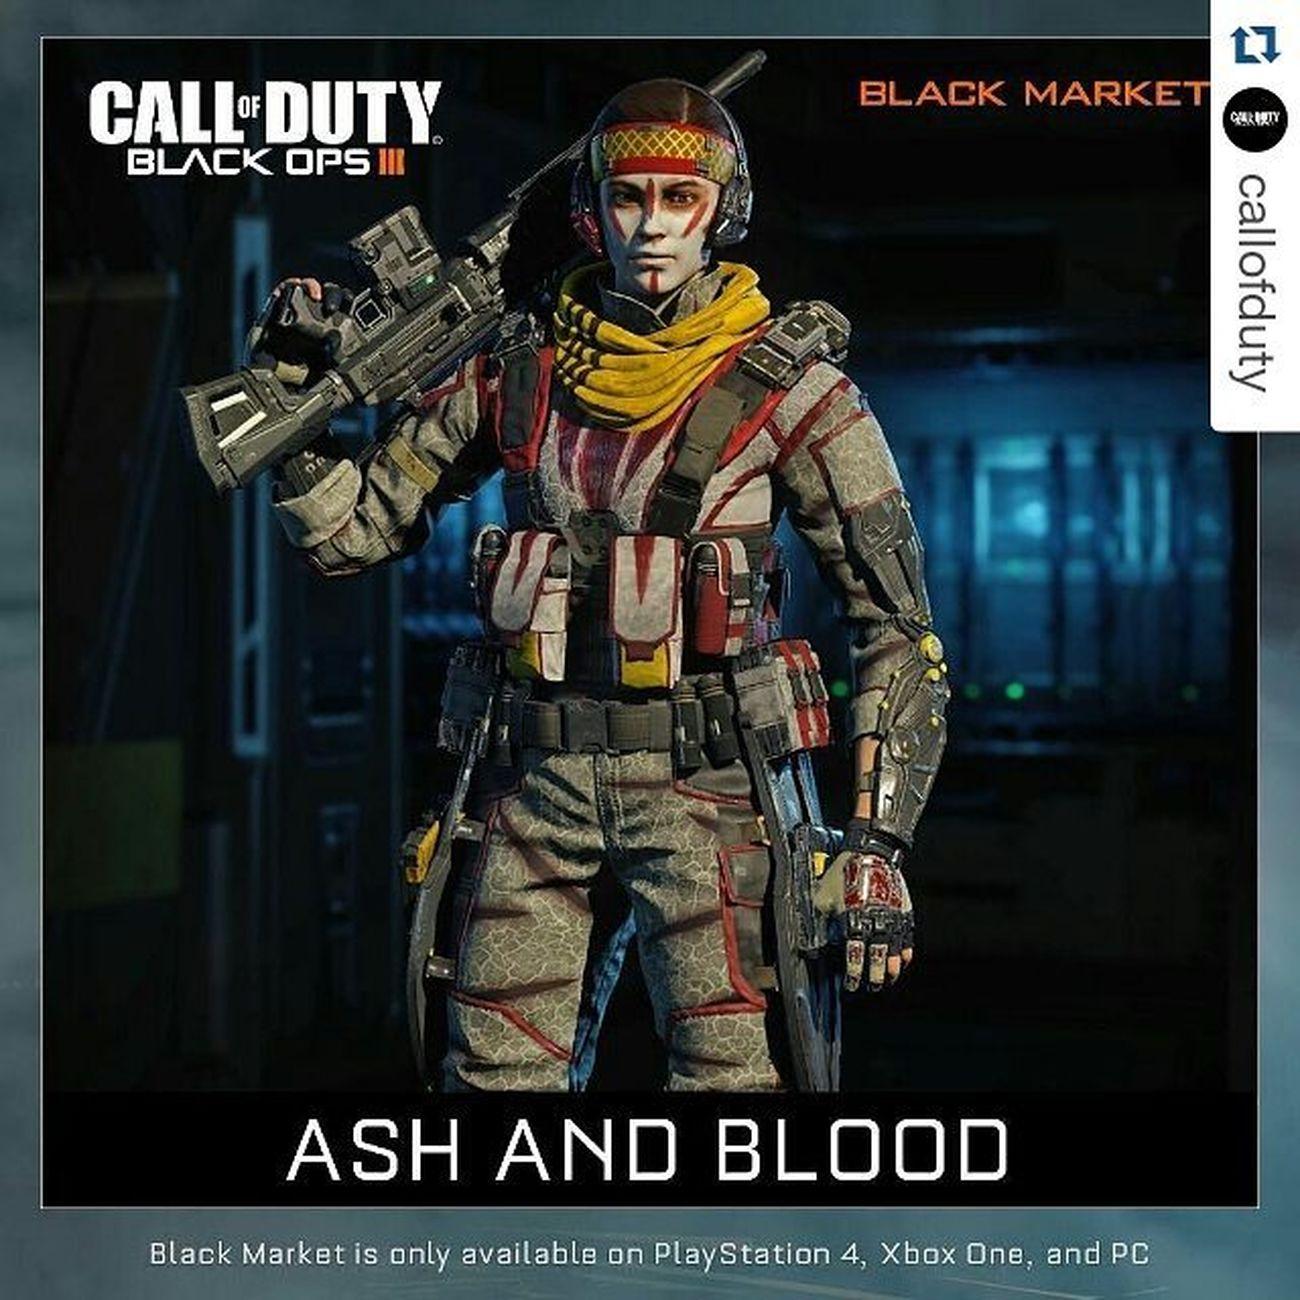 Ahh pngn main Black Ops III 🎮🎮🎮 . @callofduty CallOfDuty Blackops3